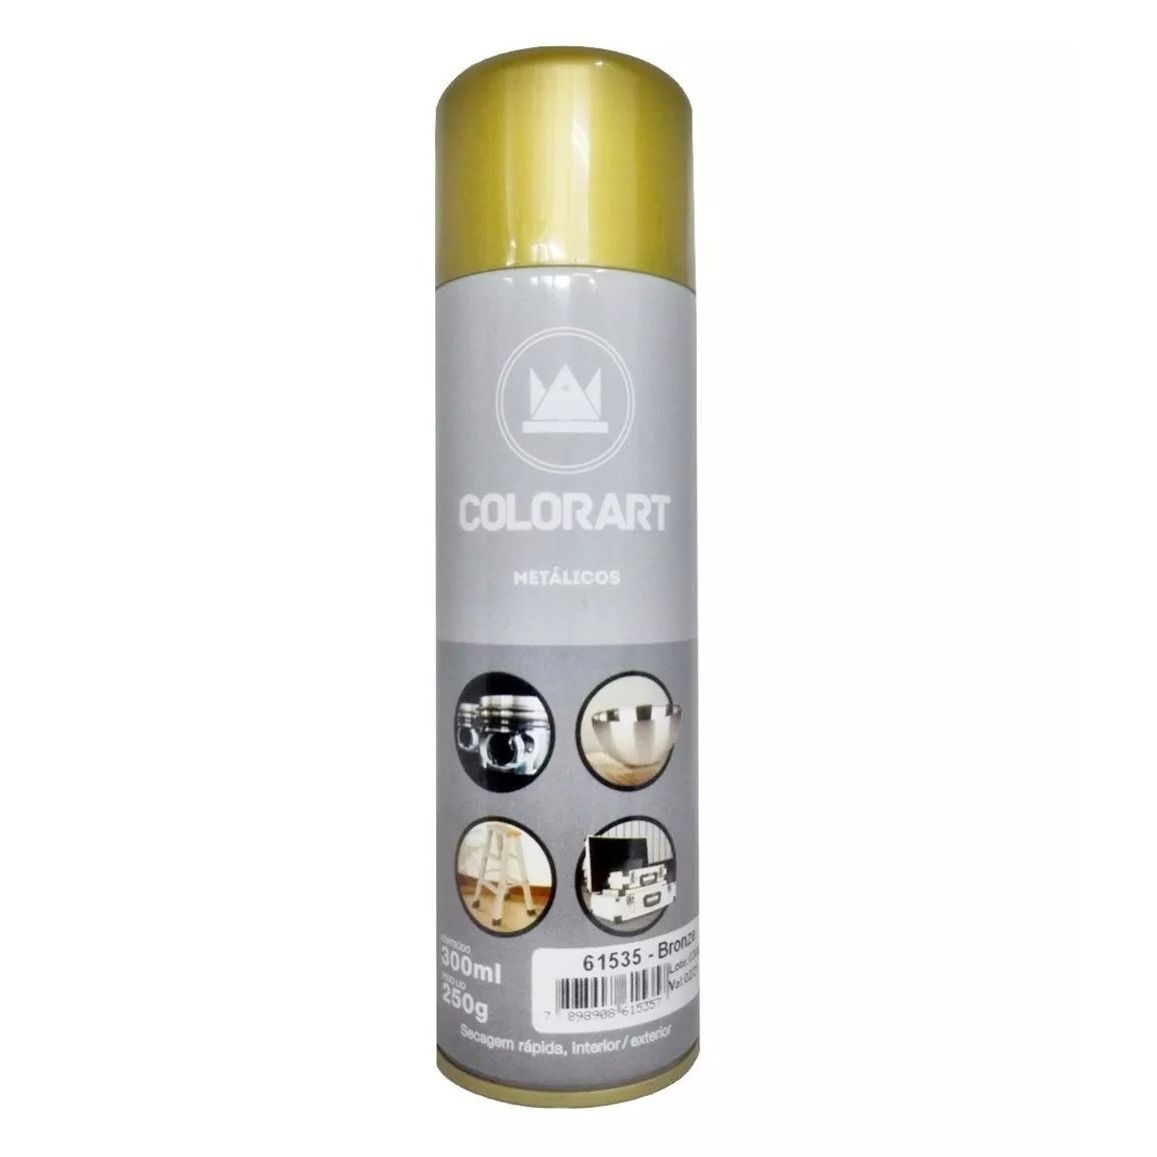 Tinta Spray ColorArt Bronze Metálico  - Rea Comércio - Sua Loja Completa!